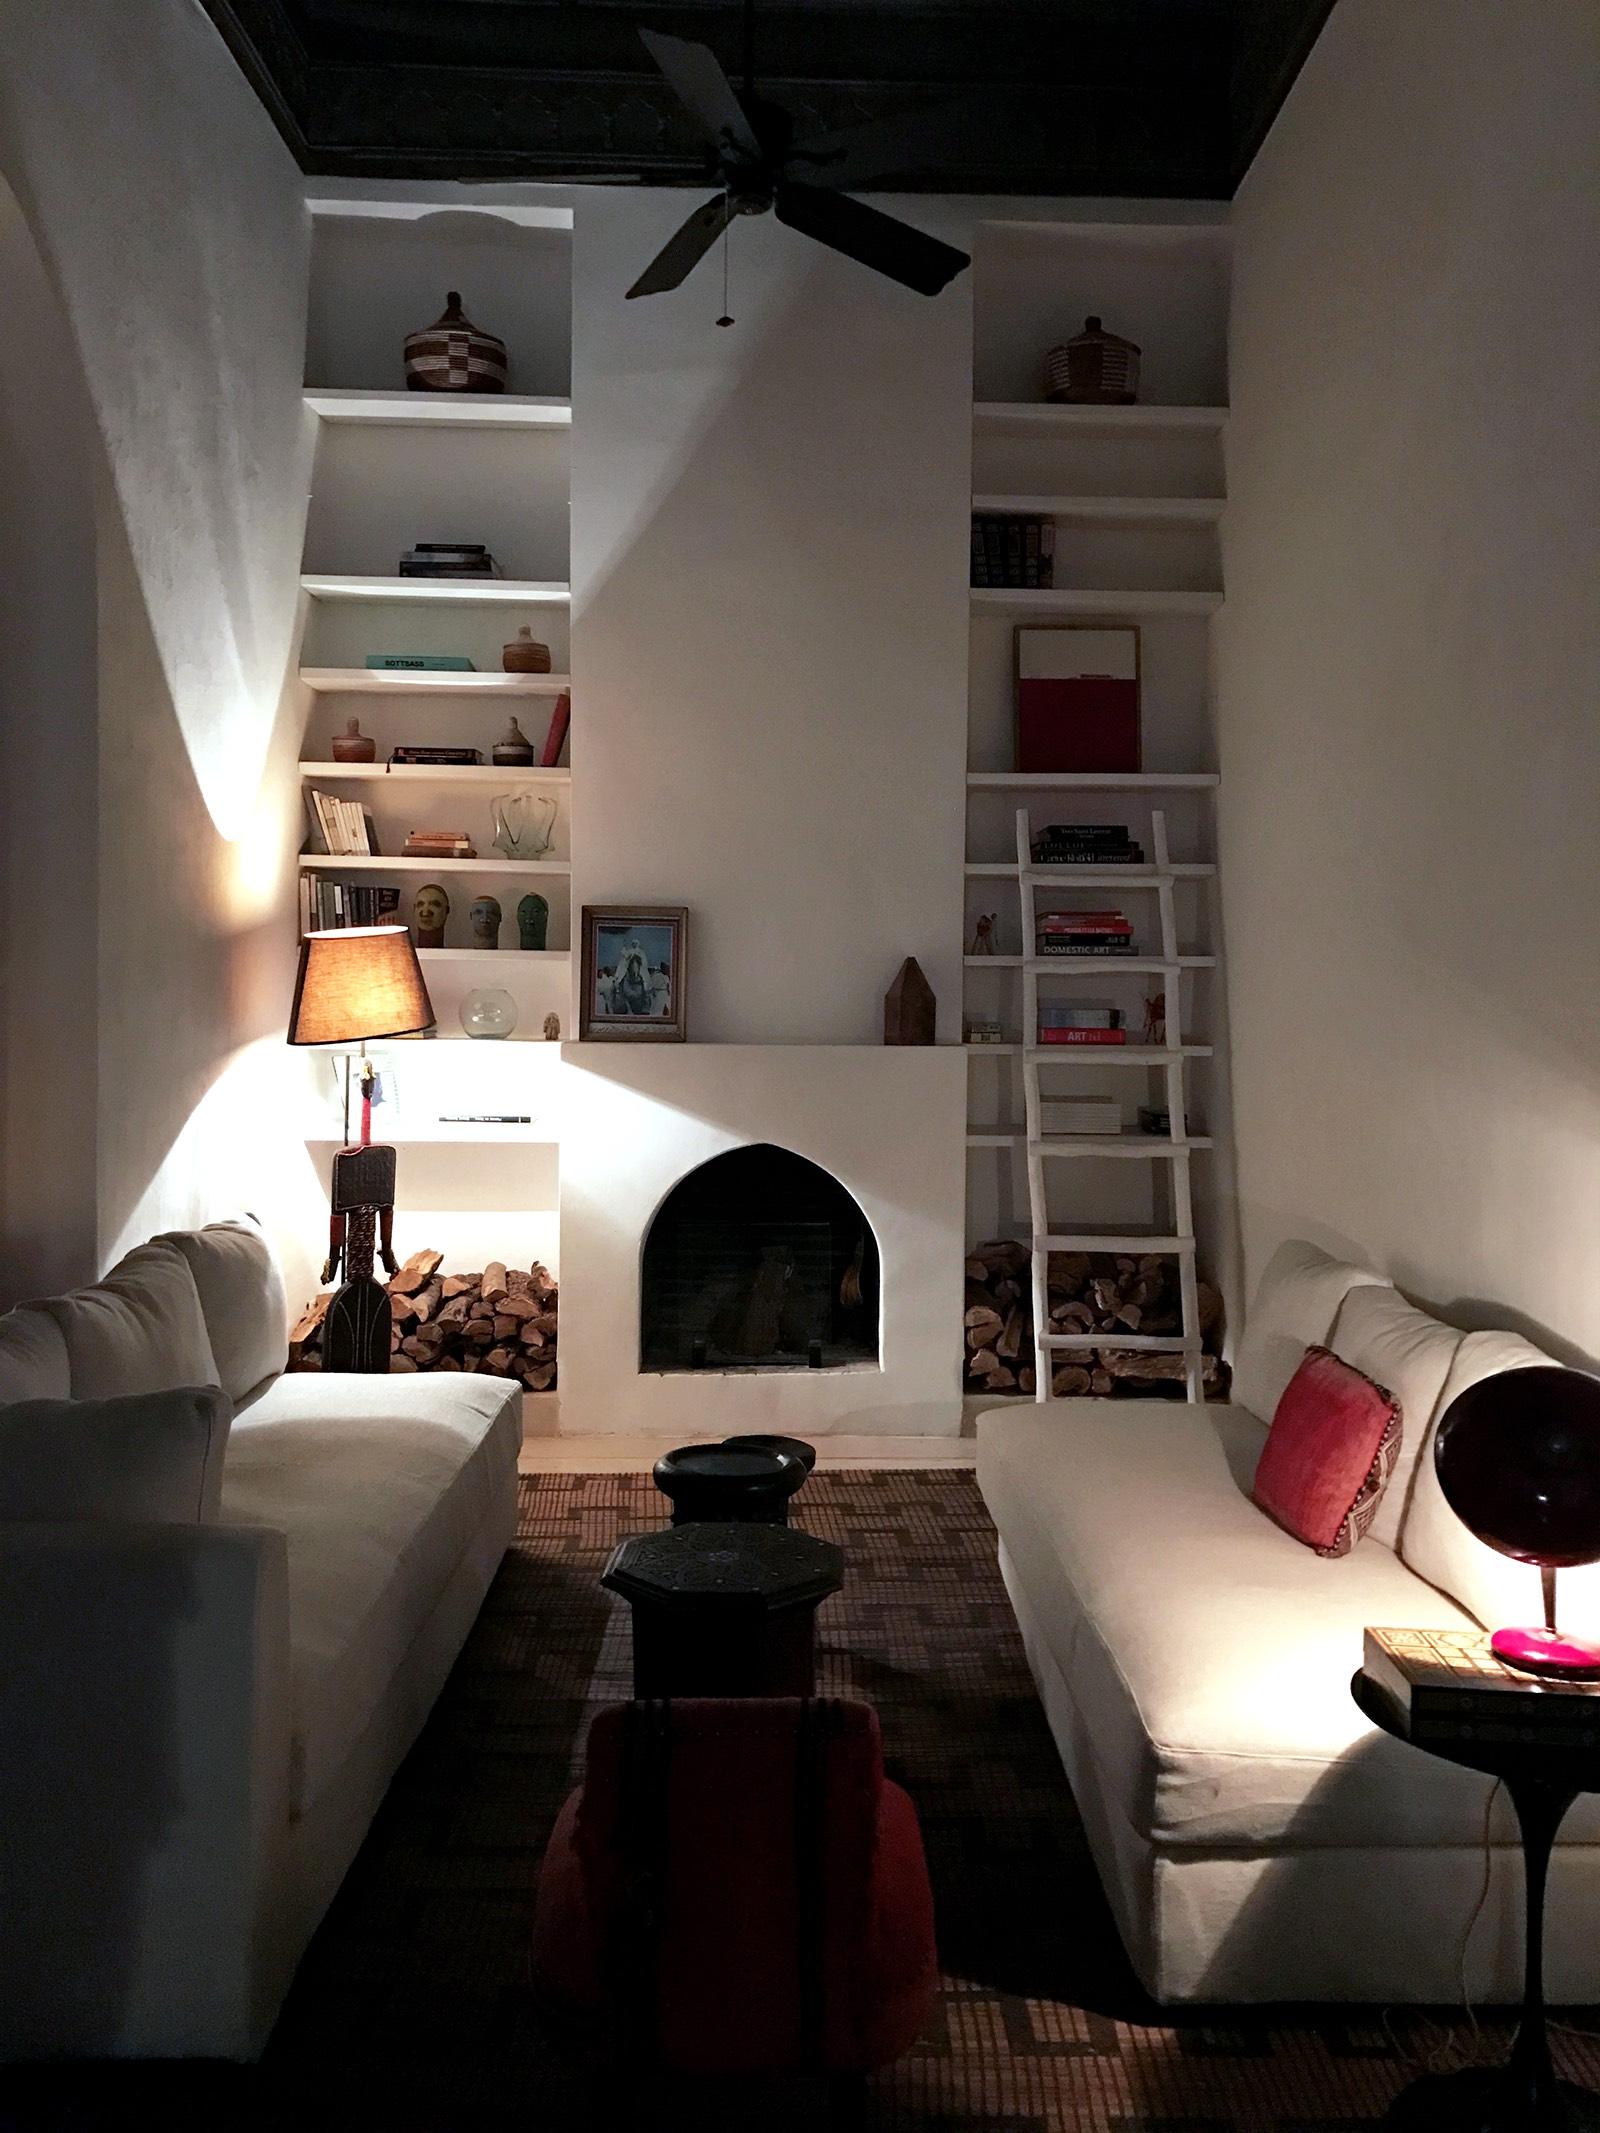 Marrakesh-Riad-Be-Mena-living-space.jpg